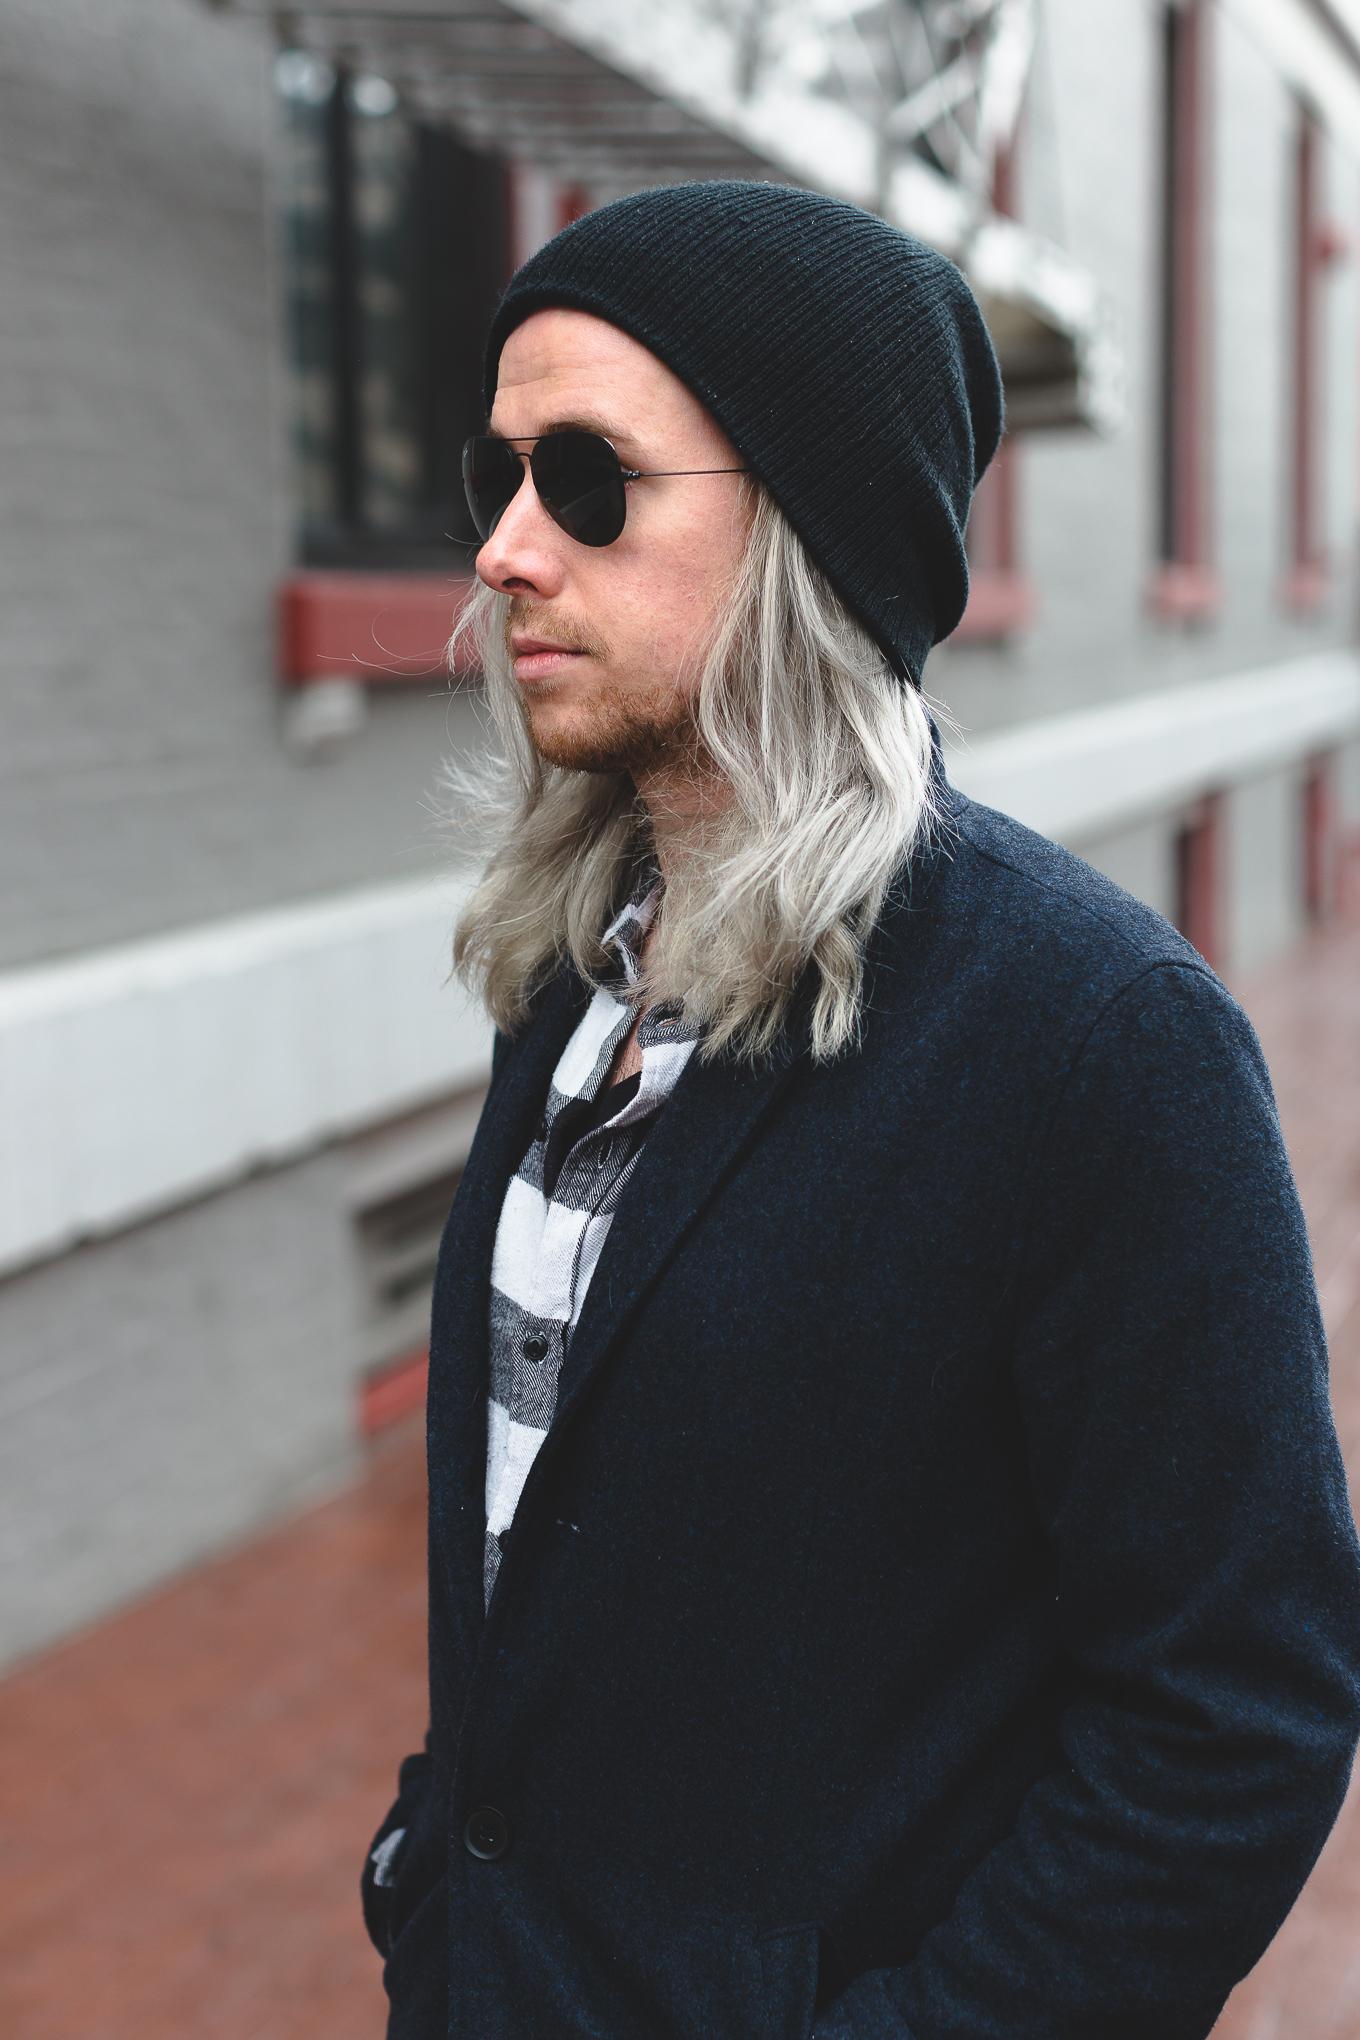 mens sunglasses, black rayban sunglasses, rayban aviator sunglasses